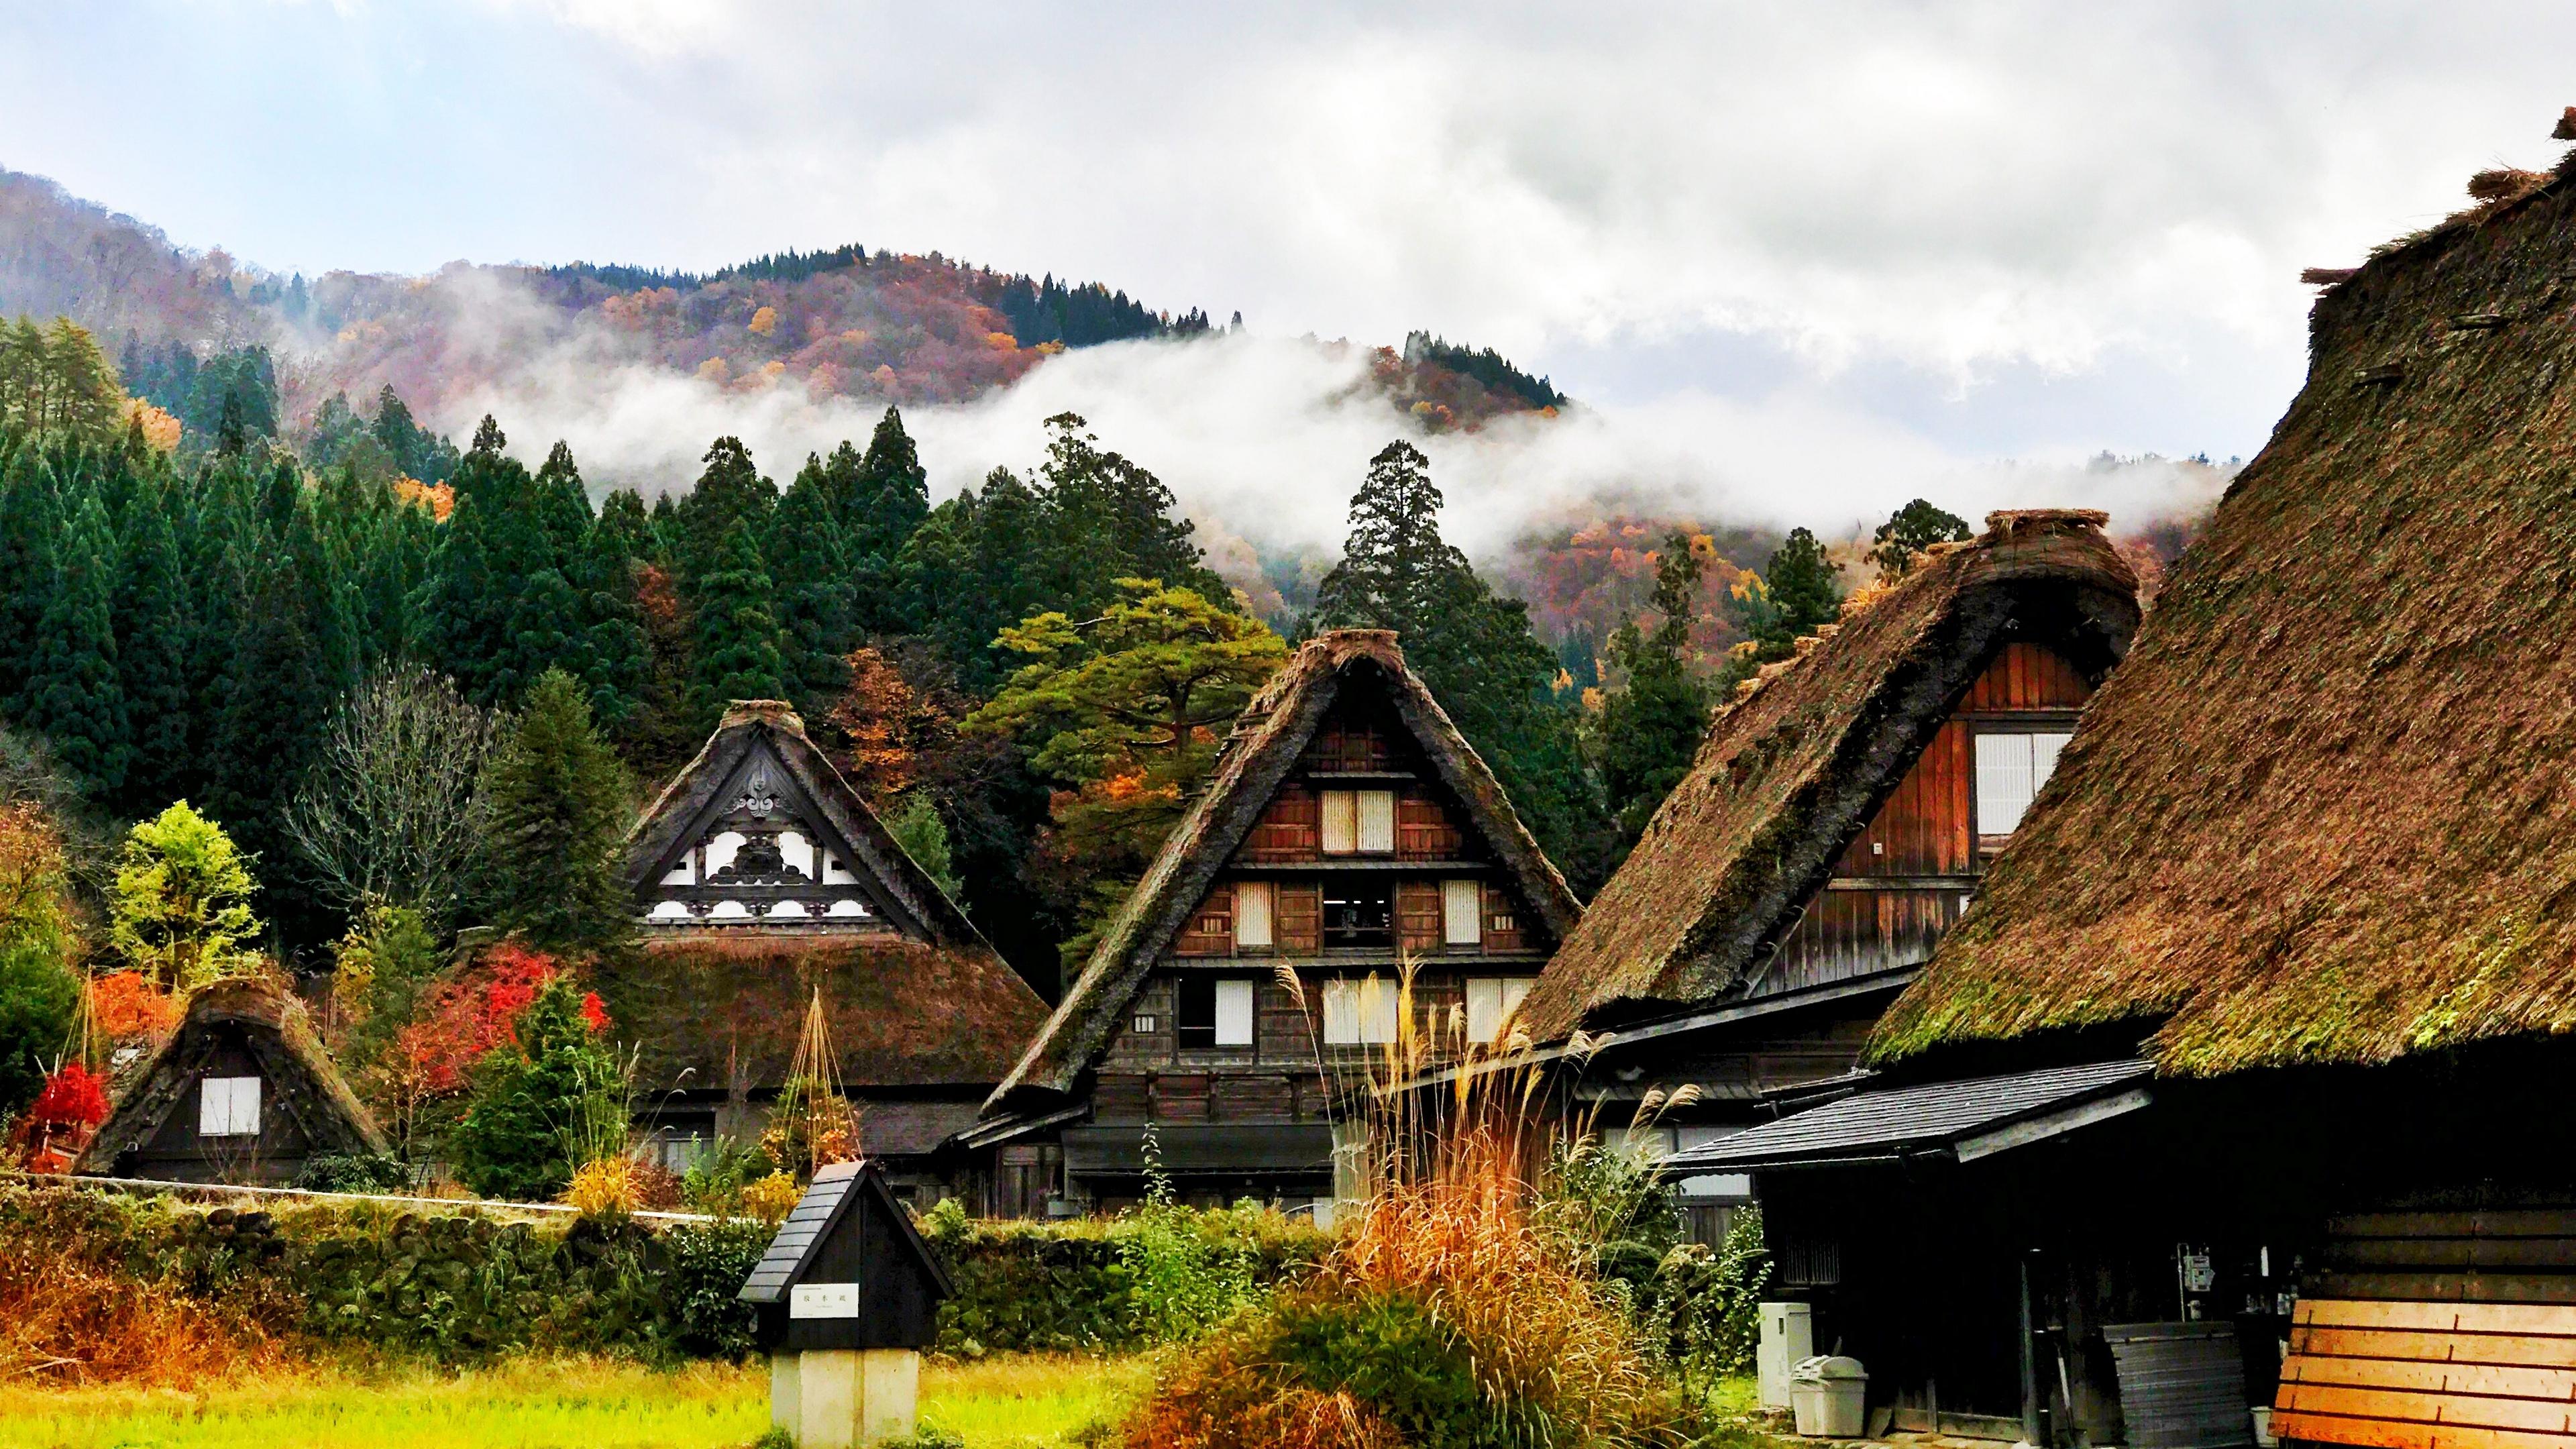 japan shirakawa houses mountains trees 4k 1538066847 - japan, shirakawa, houses, mountains, trees 4k - shirakawa, Japan, Houses